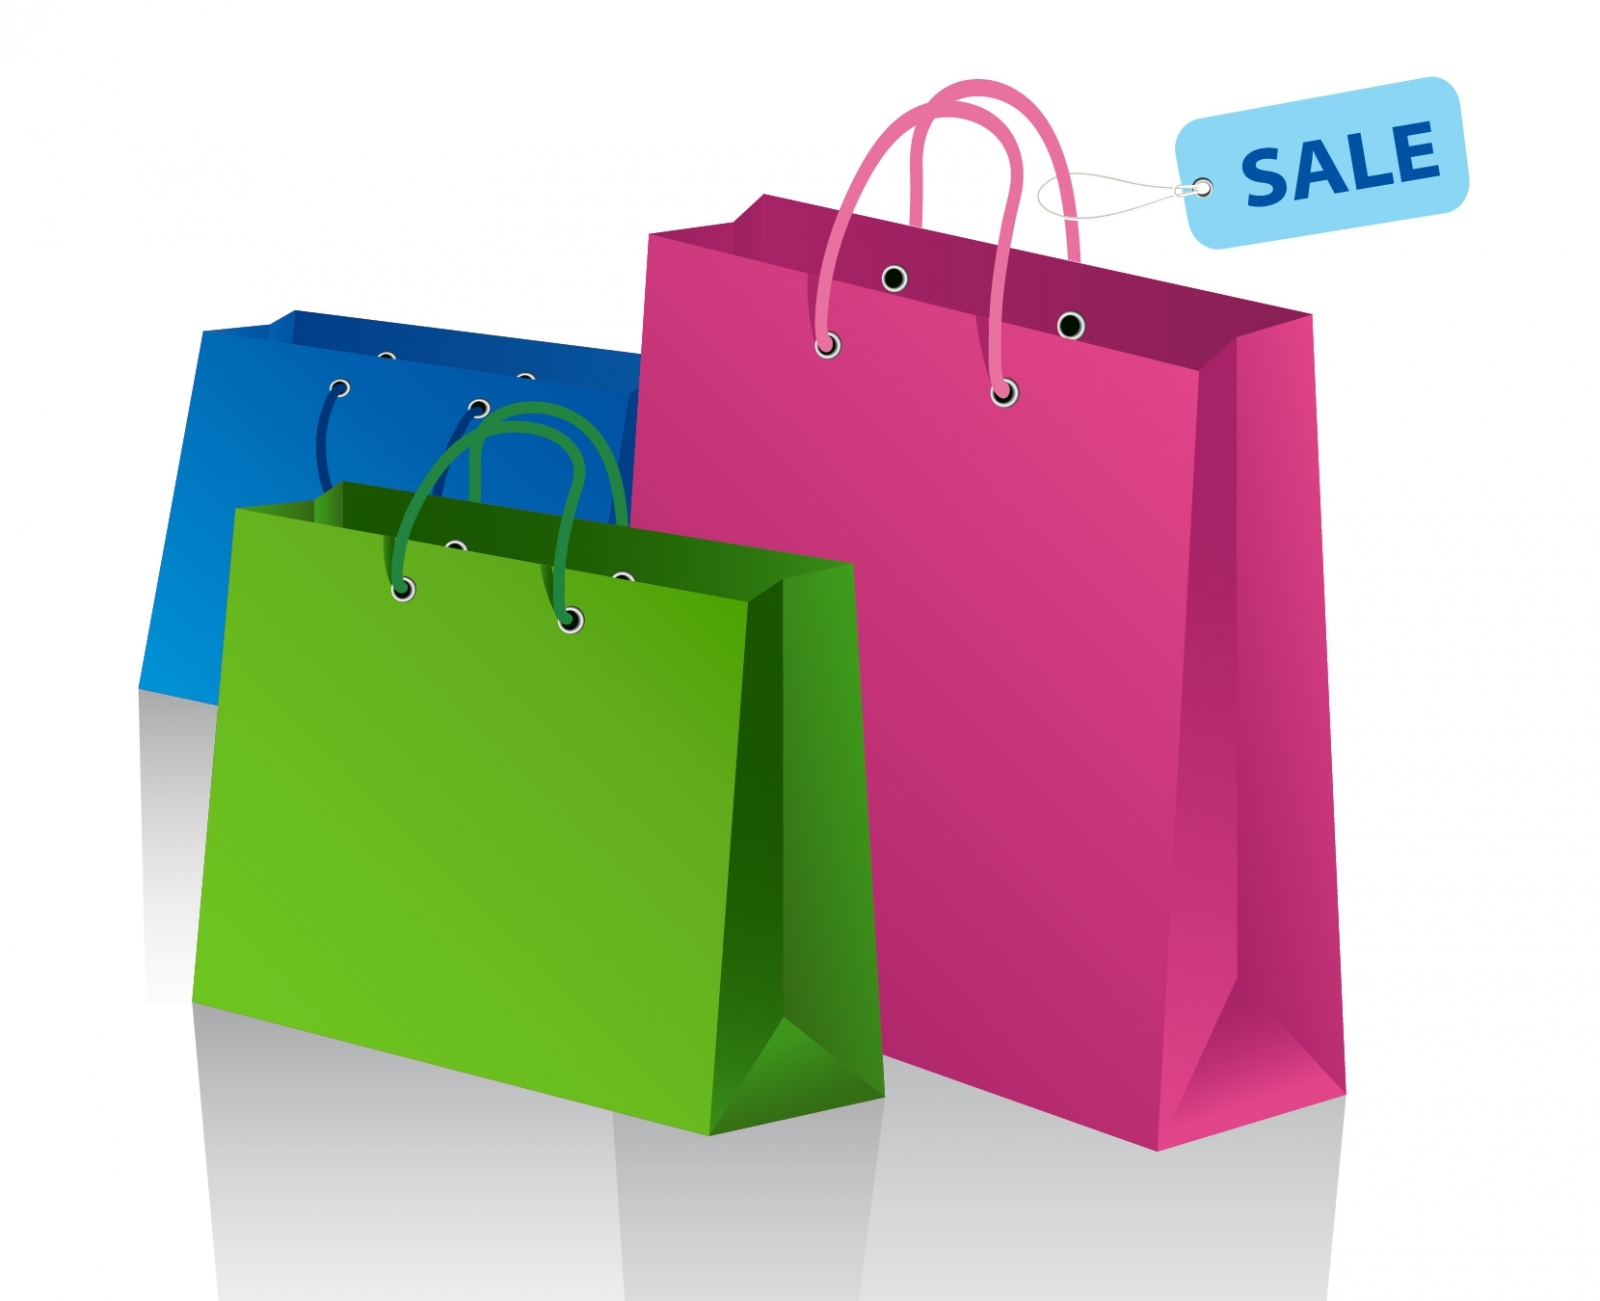 Shopping bag clipart Unique Shopping bags shopping bag clip.